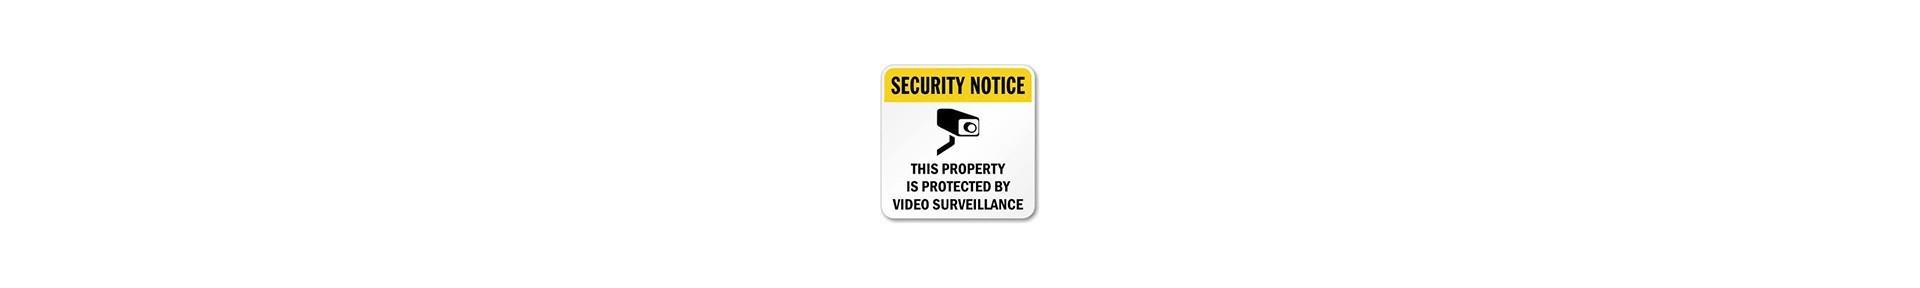 Security signs, video surveillance signs, warning signs, no trespassin